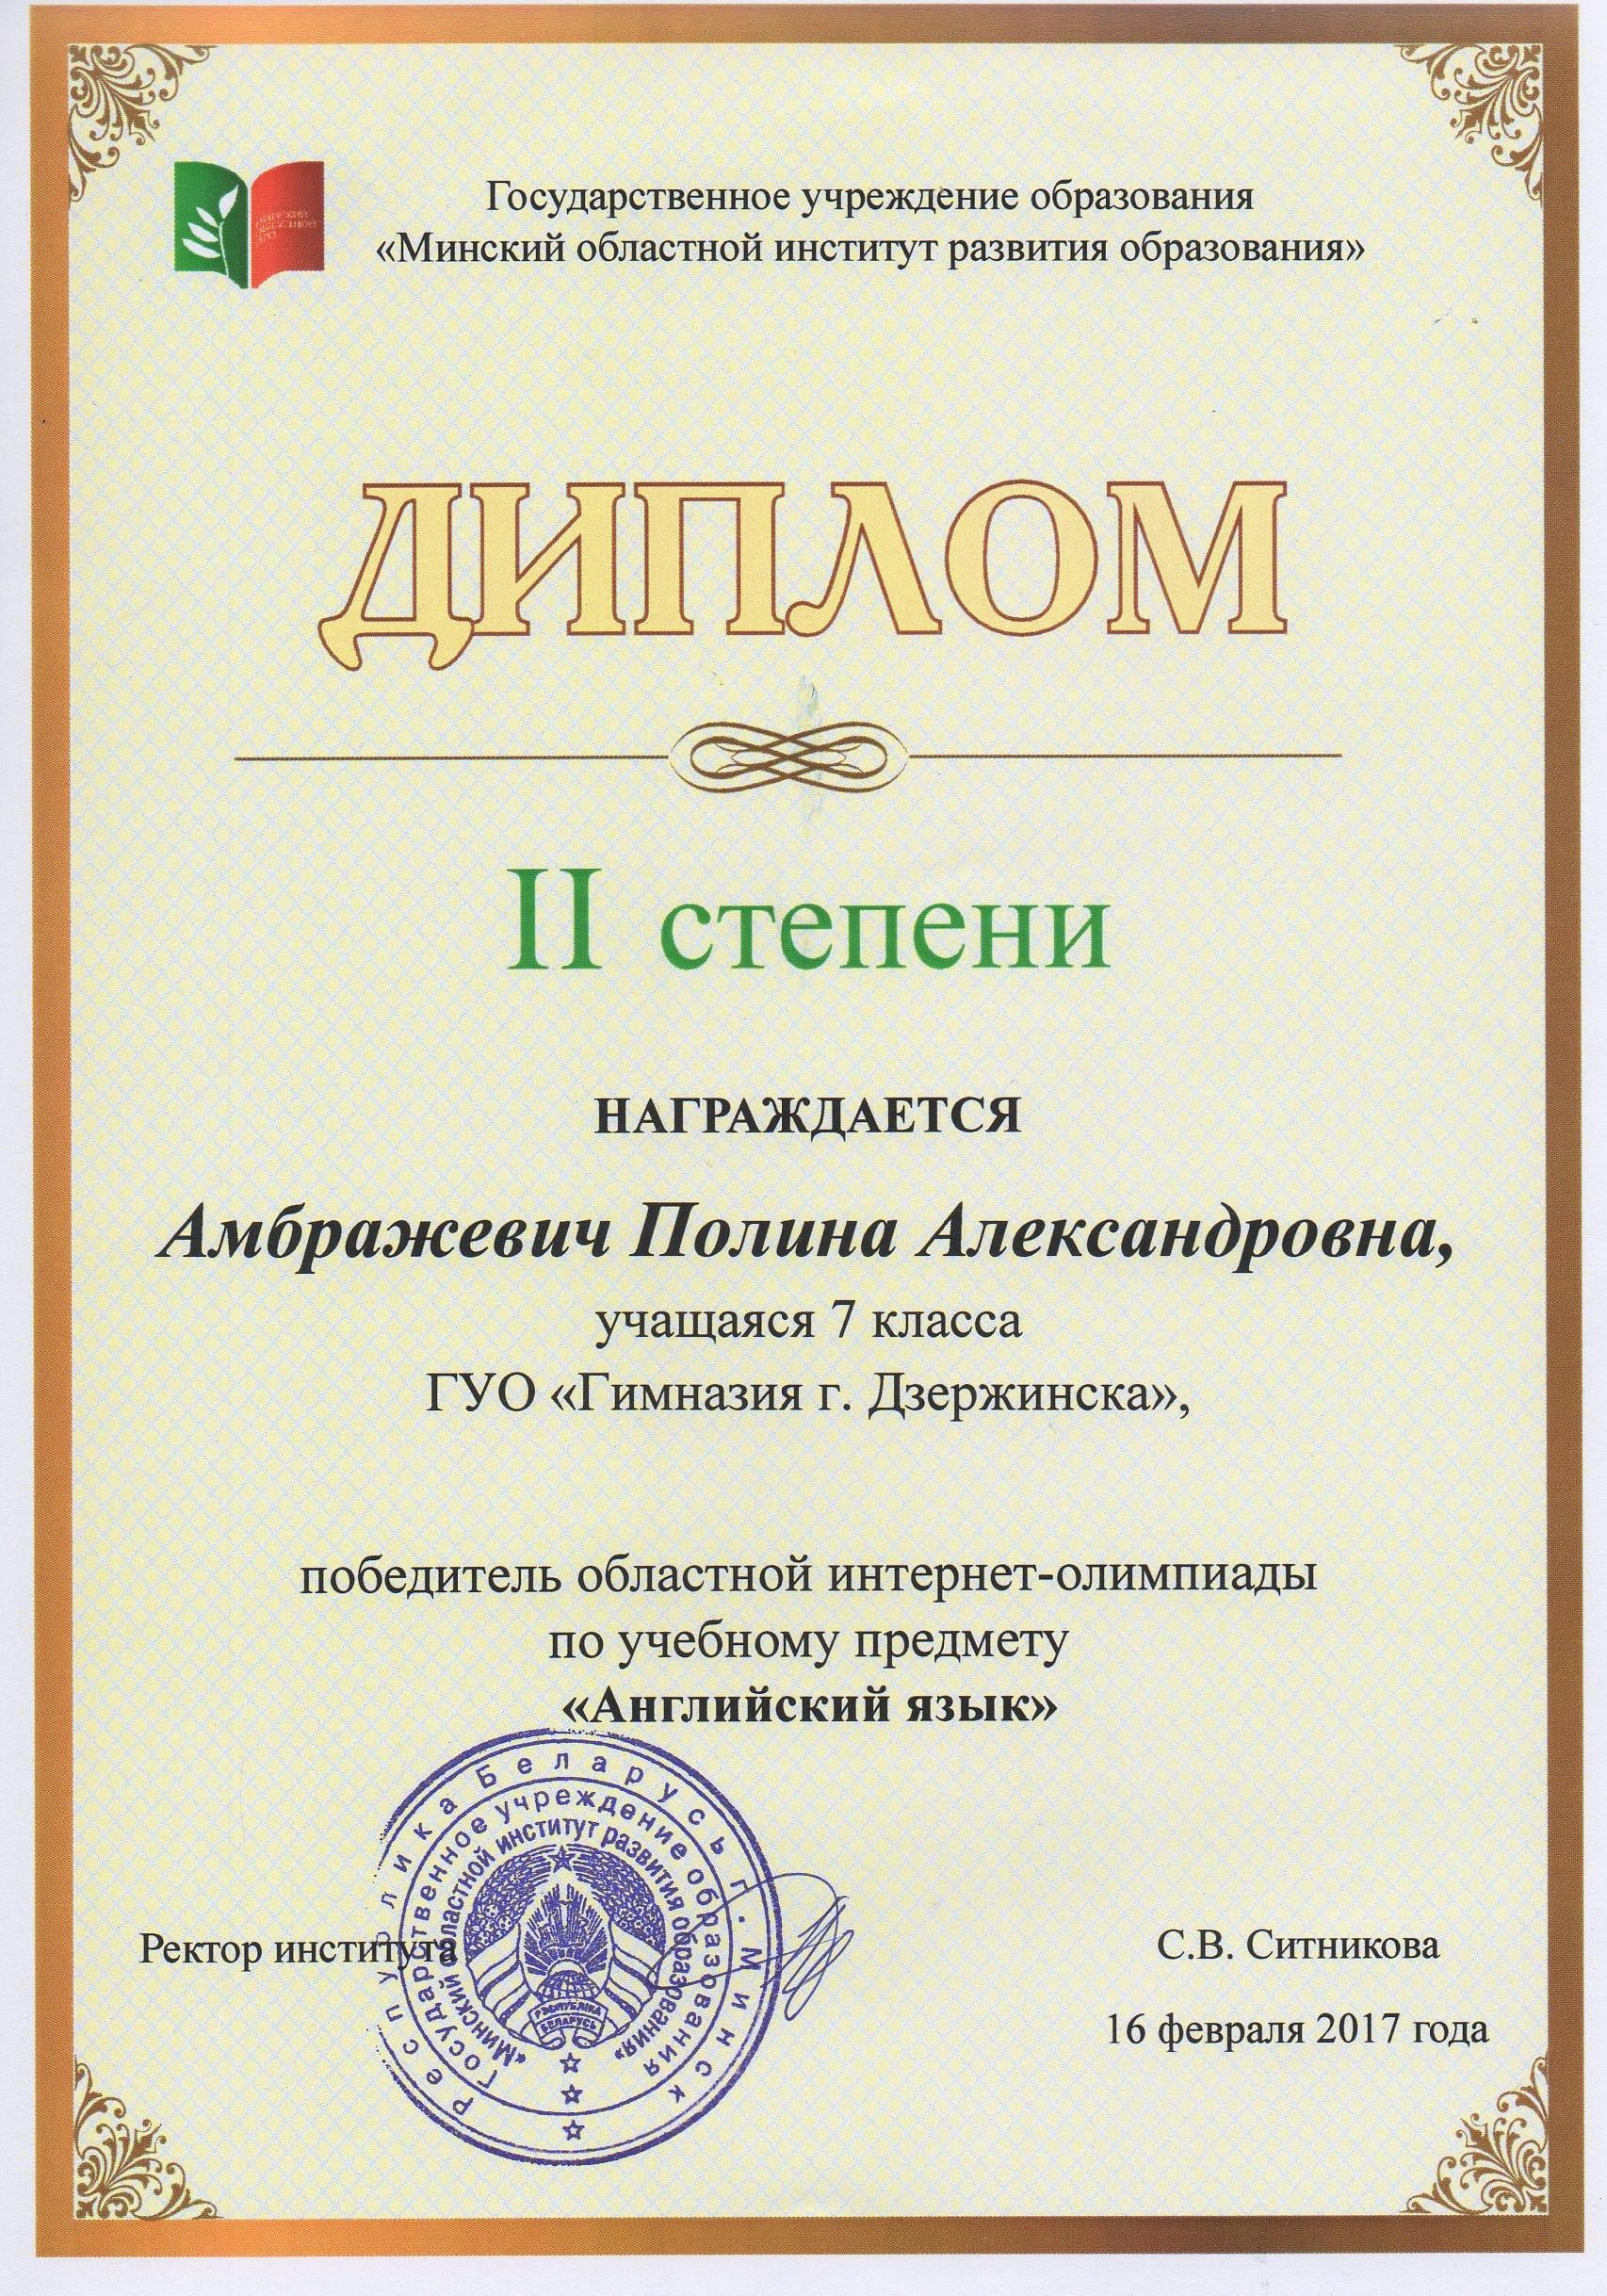 img042-2